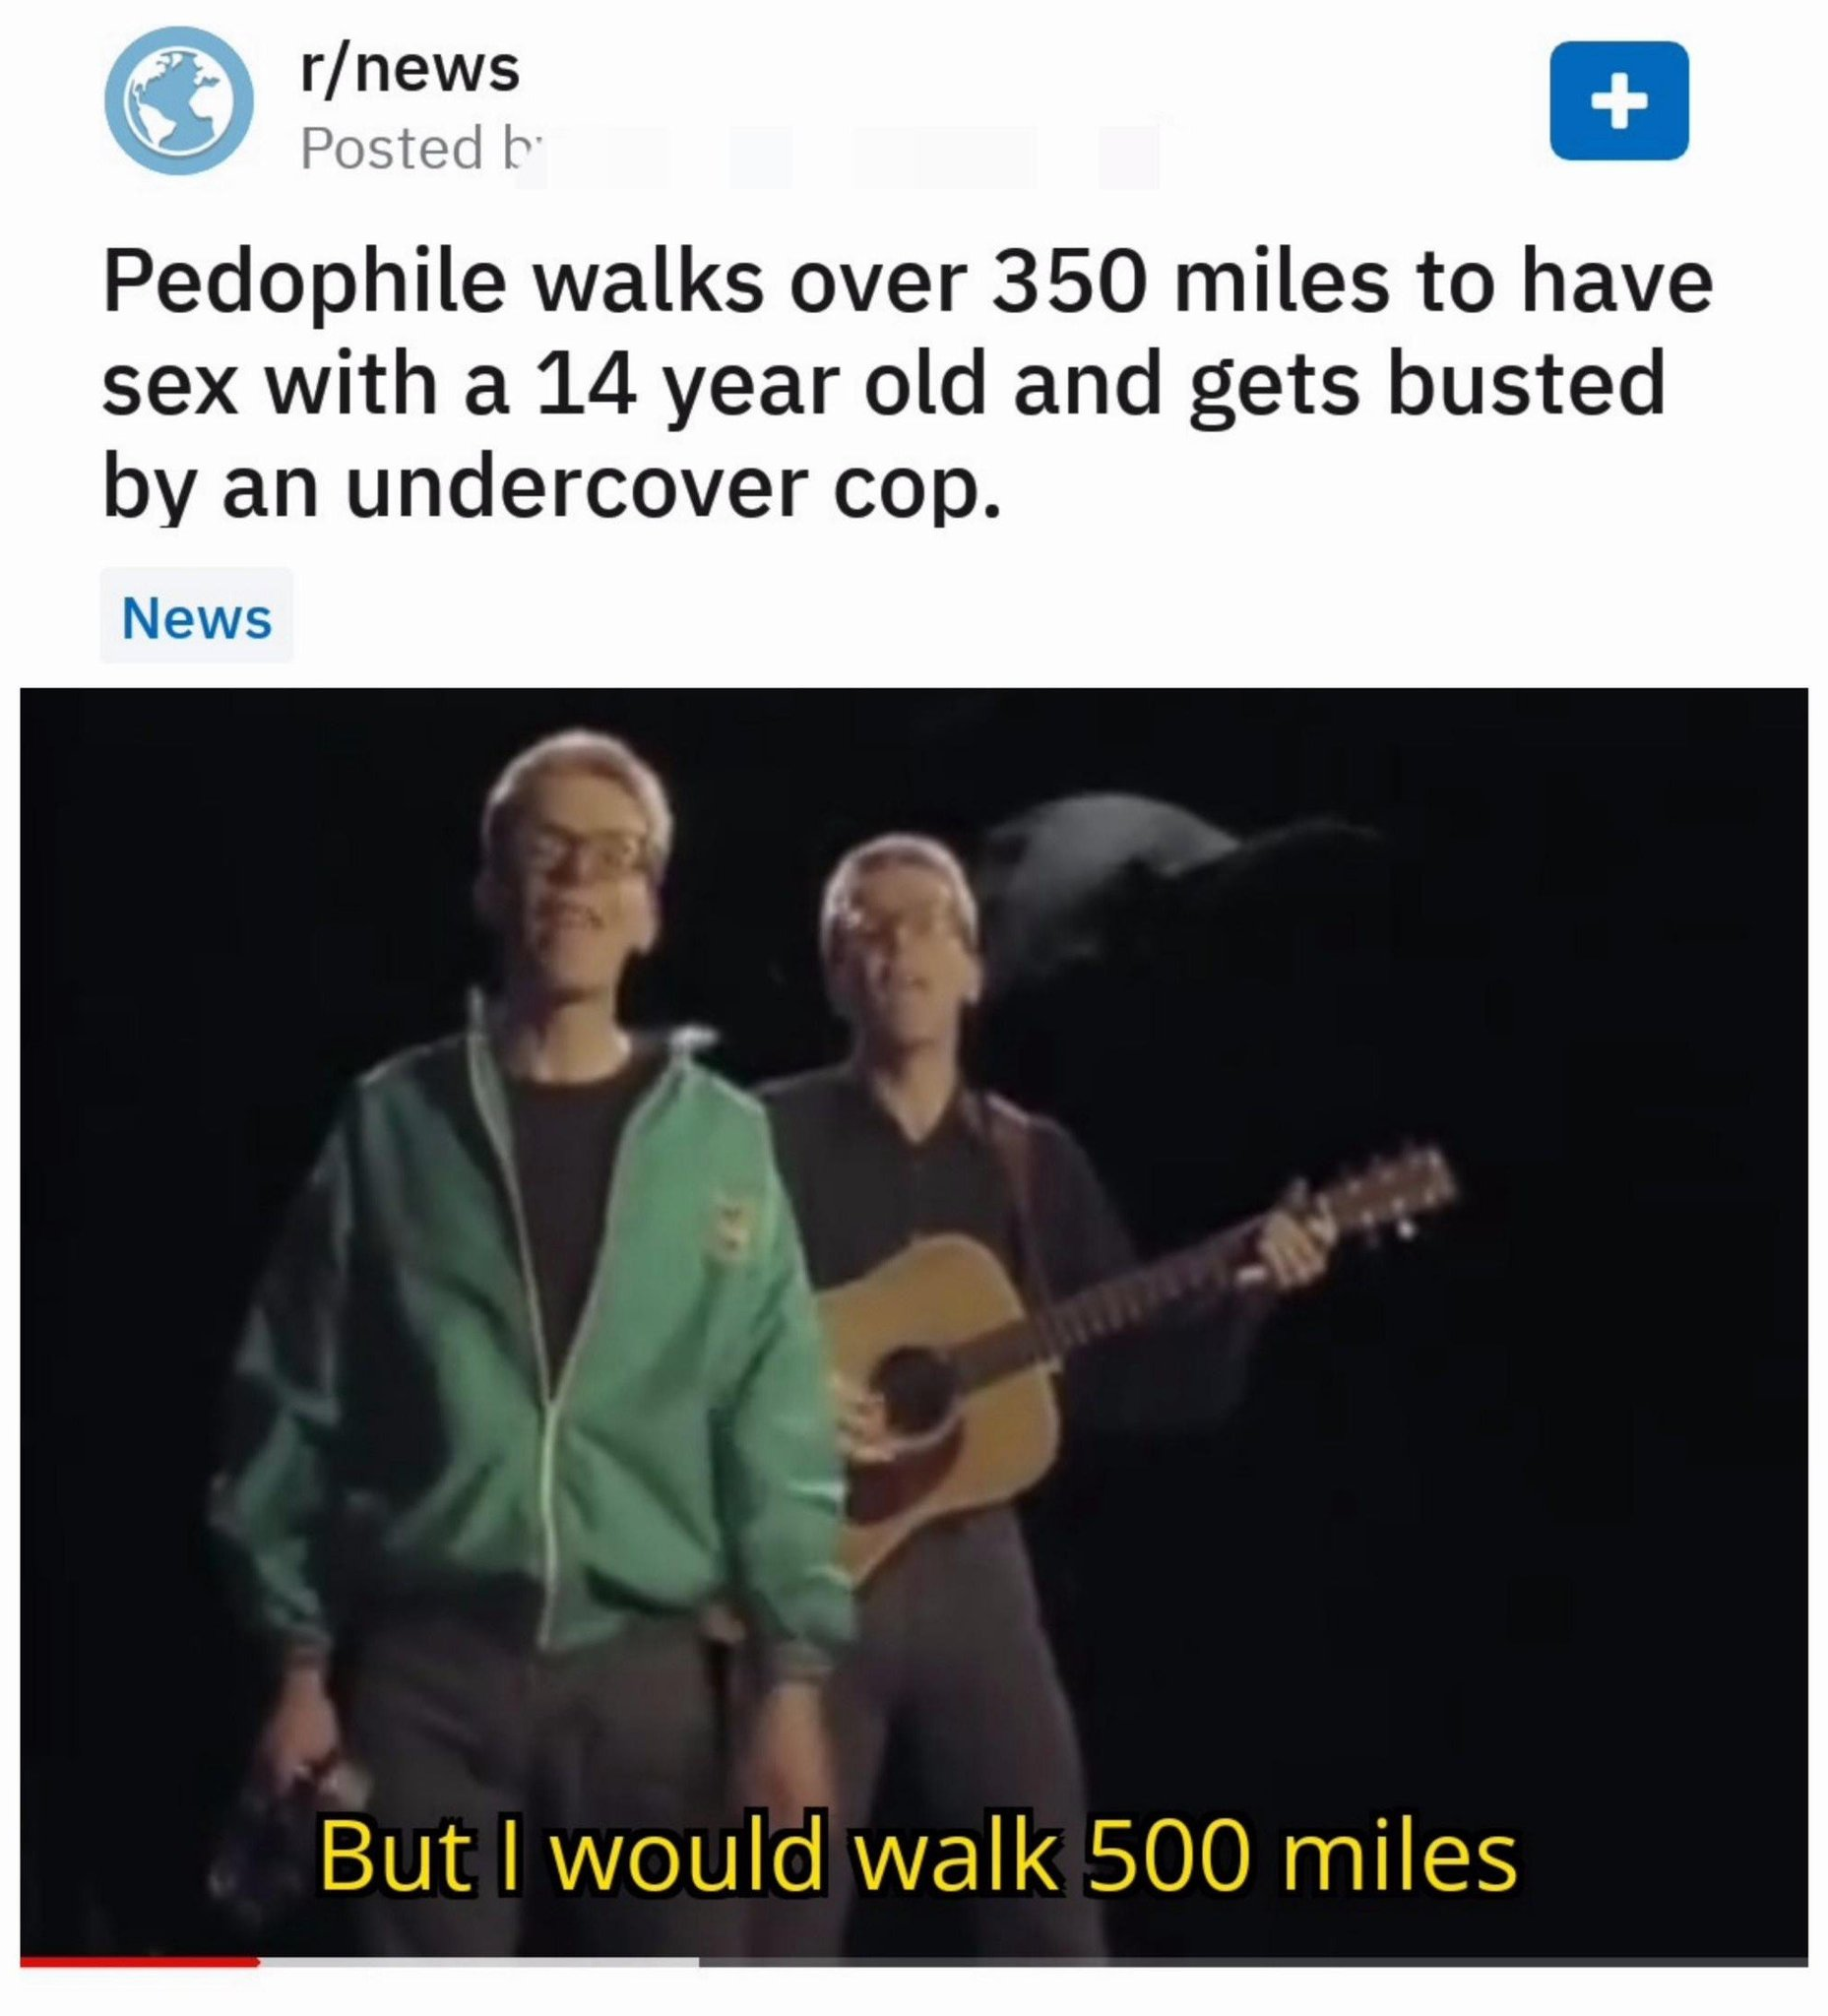 And I would walk 500 more - meme